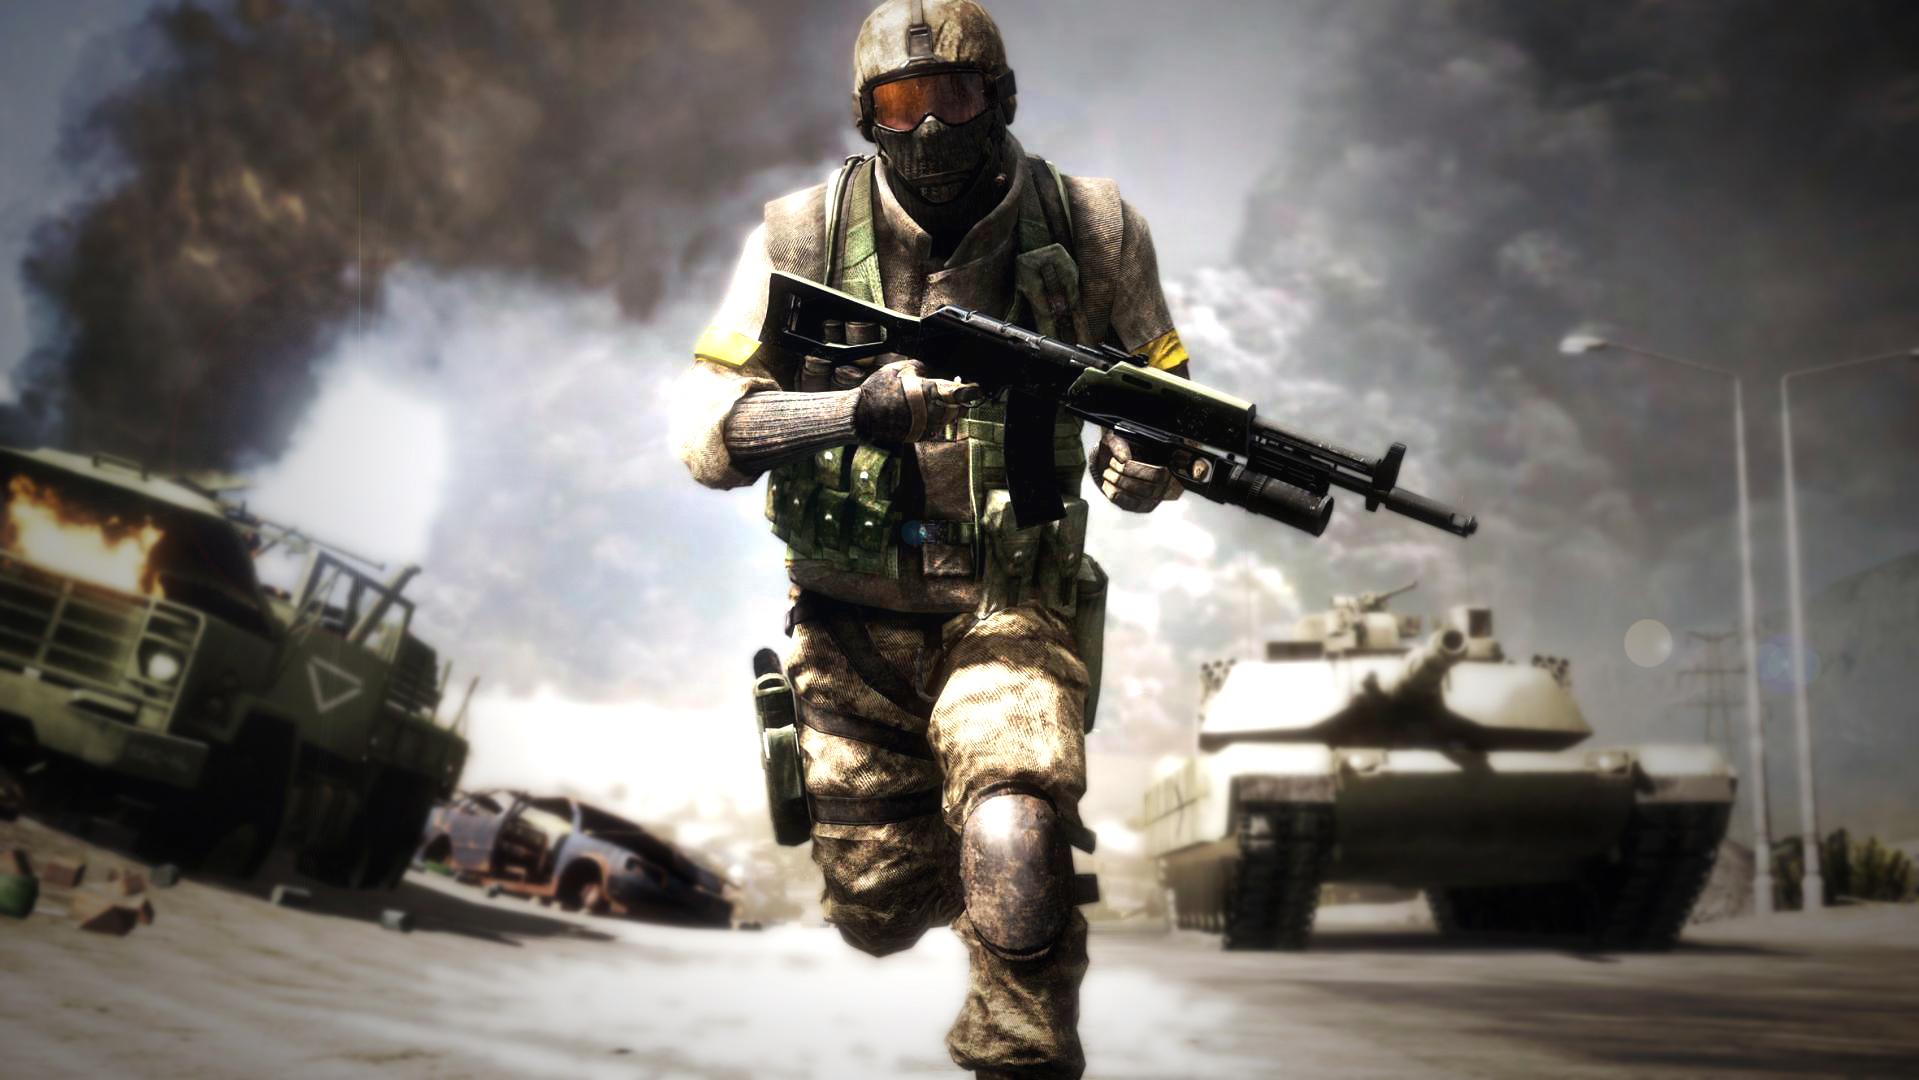 Battlefield Bad Company 1 Wallpaper